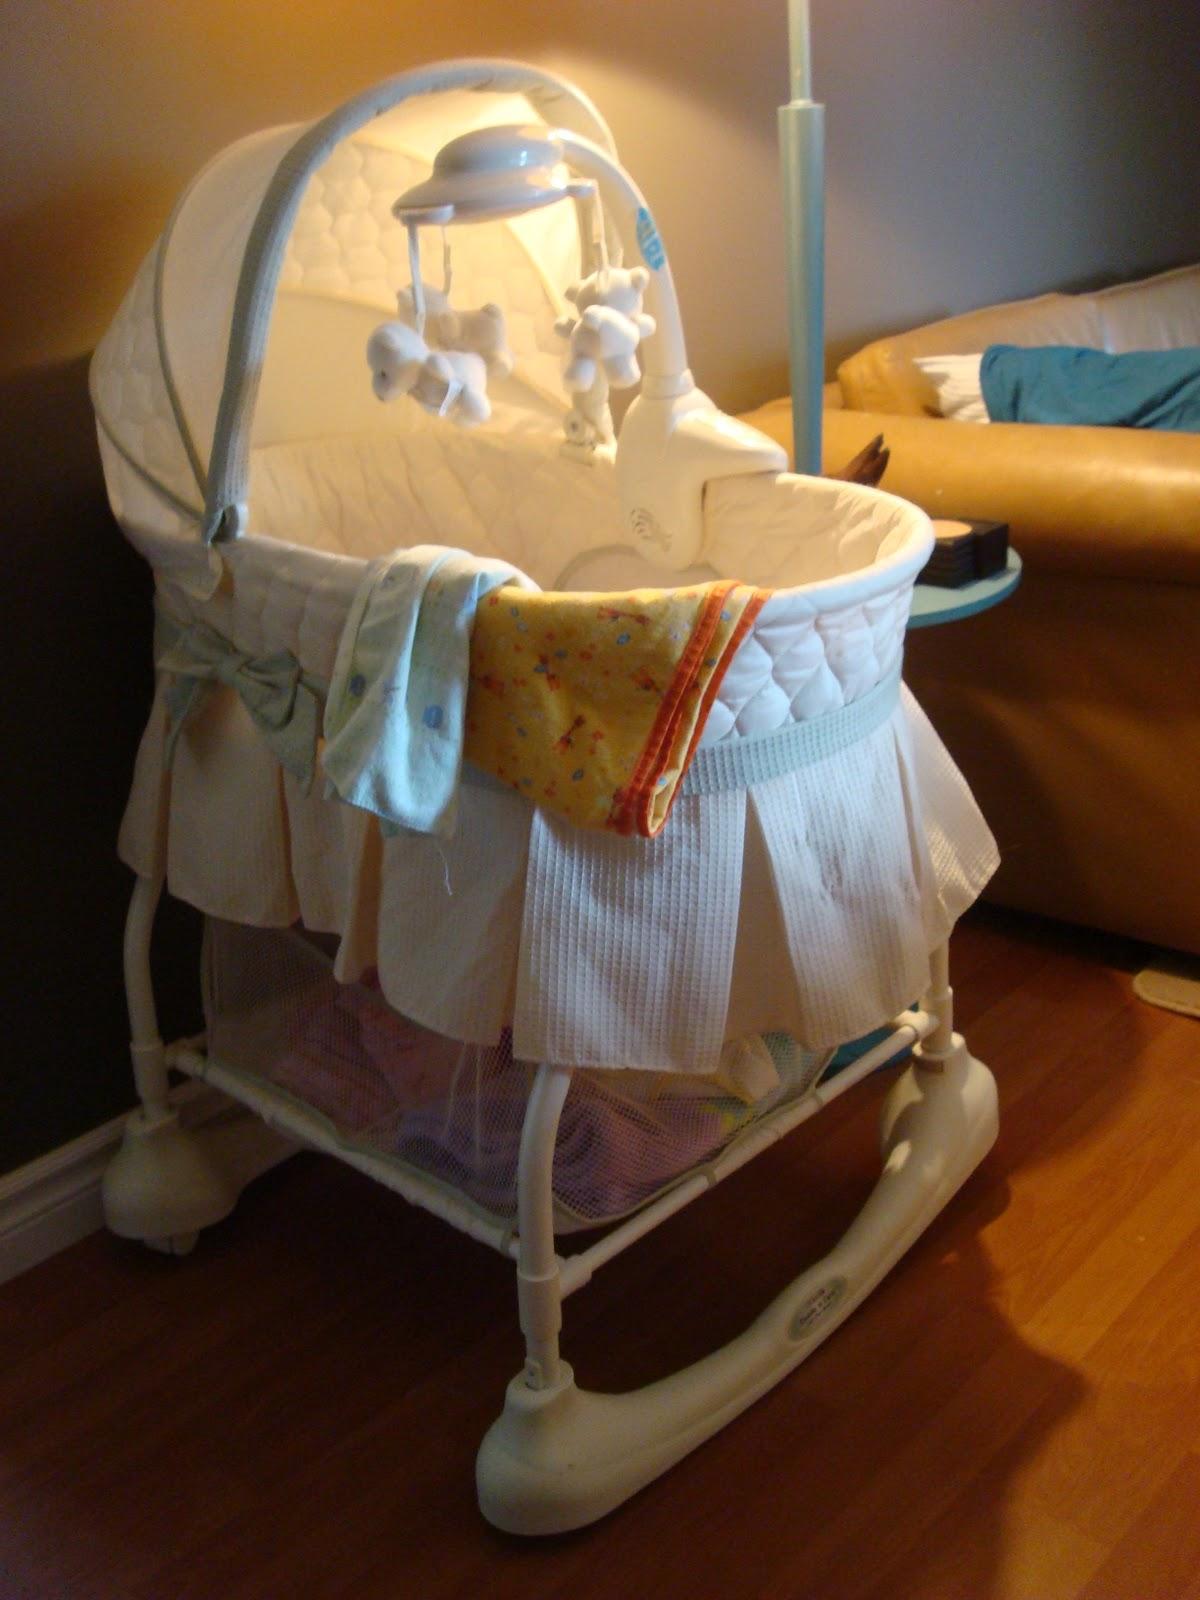 Baby cribs kijiji calgary - Baby Cribs Kijiji Calgary 8